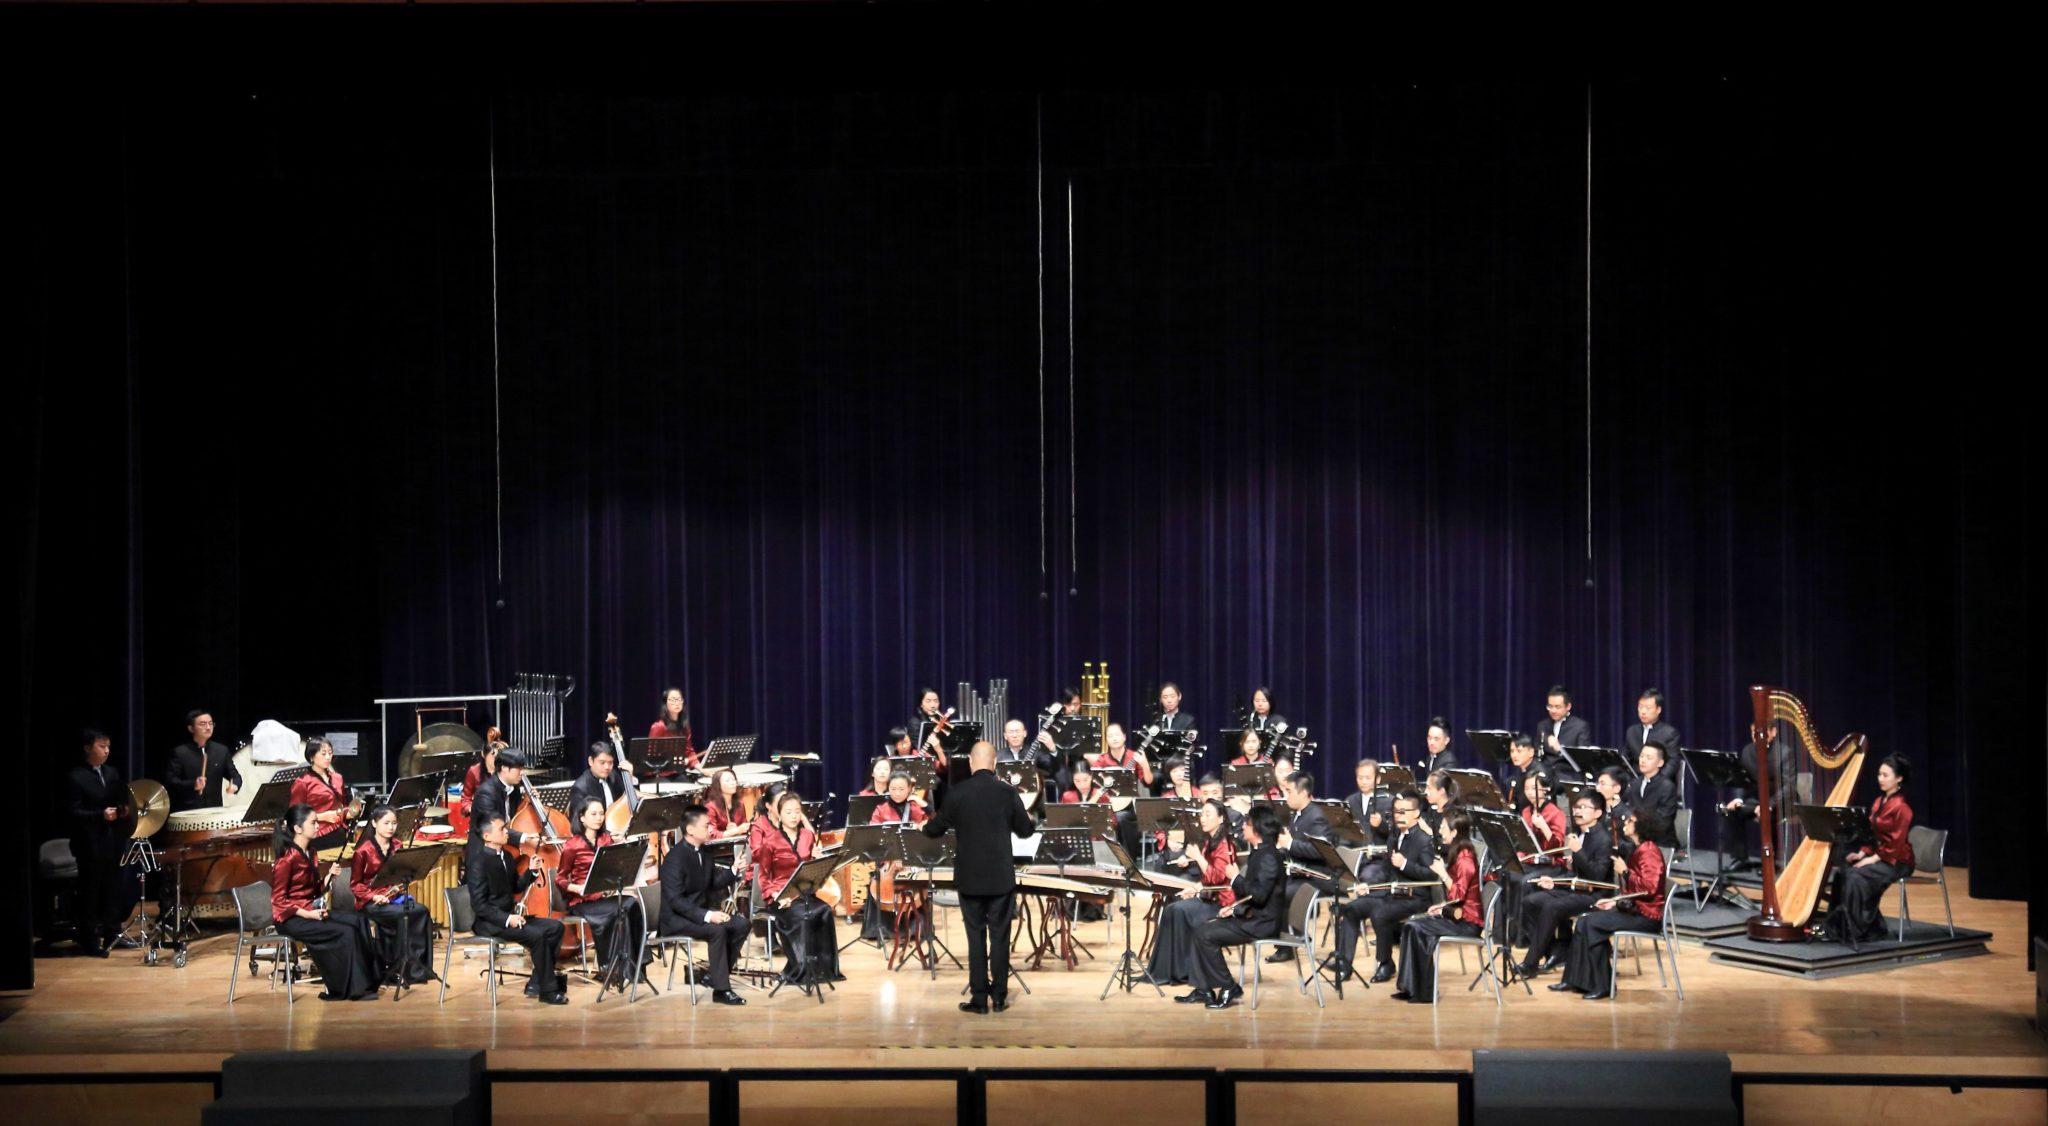 Orquestra de Macau junta-se ao MGM para concerto comemorativo